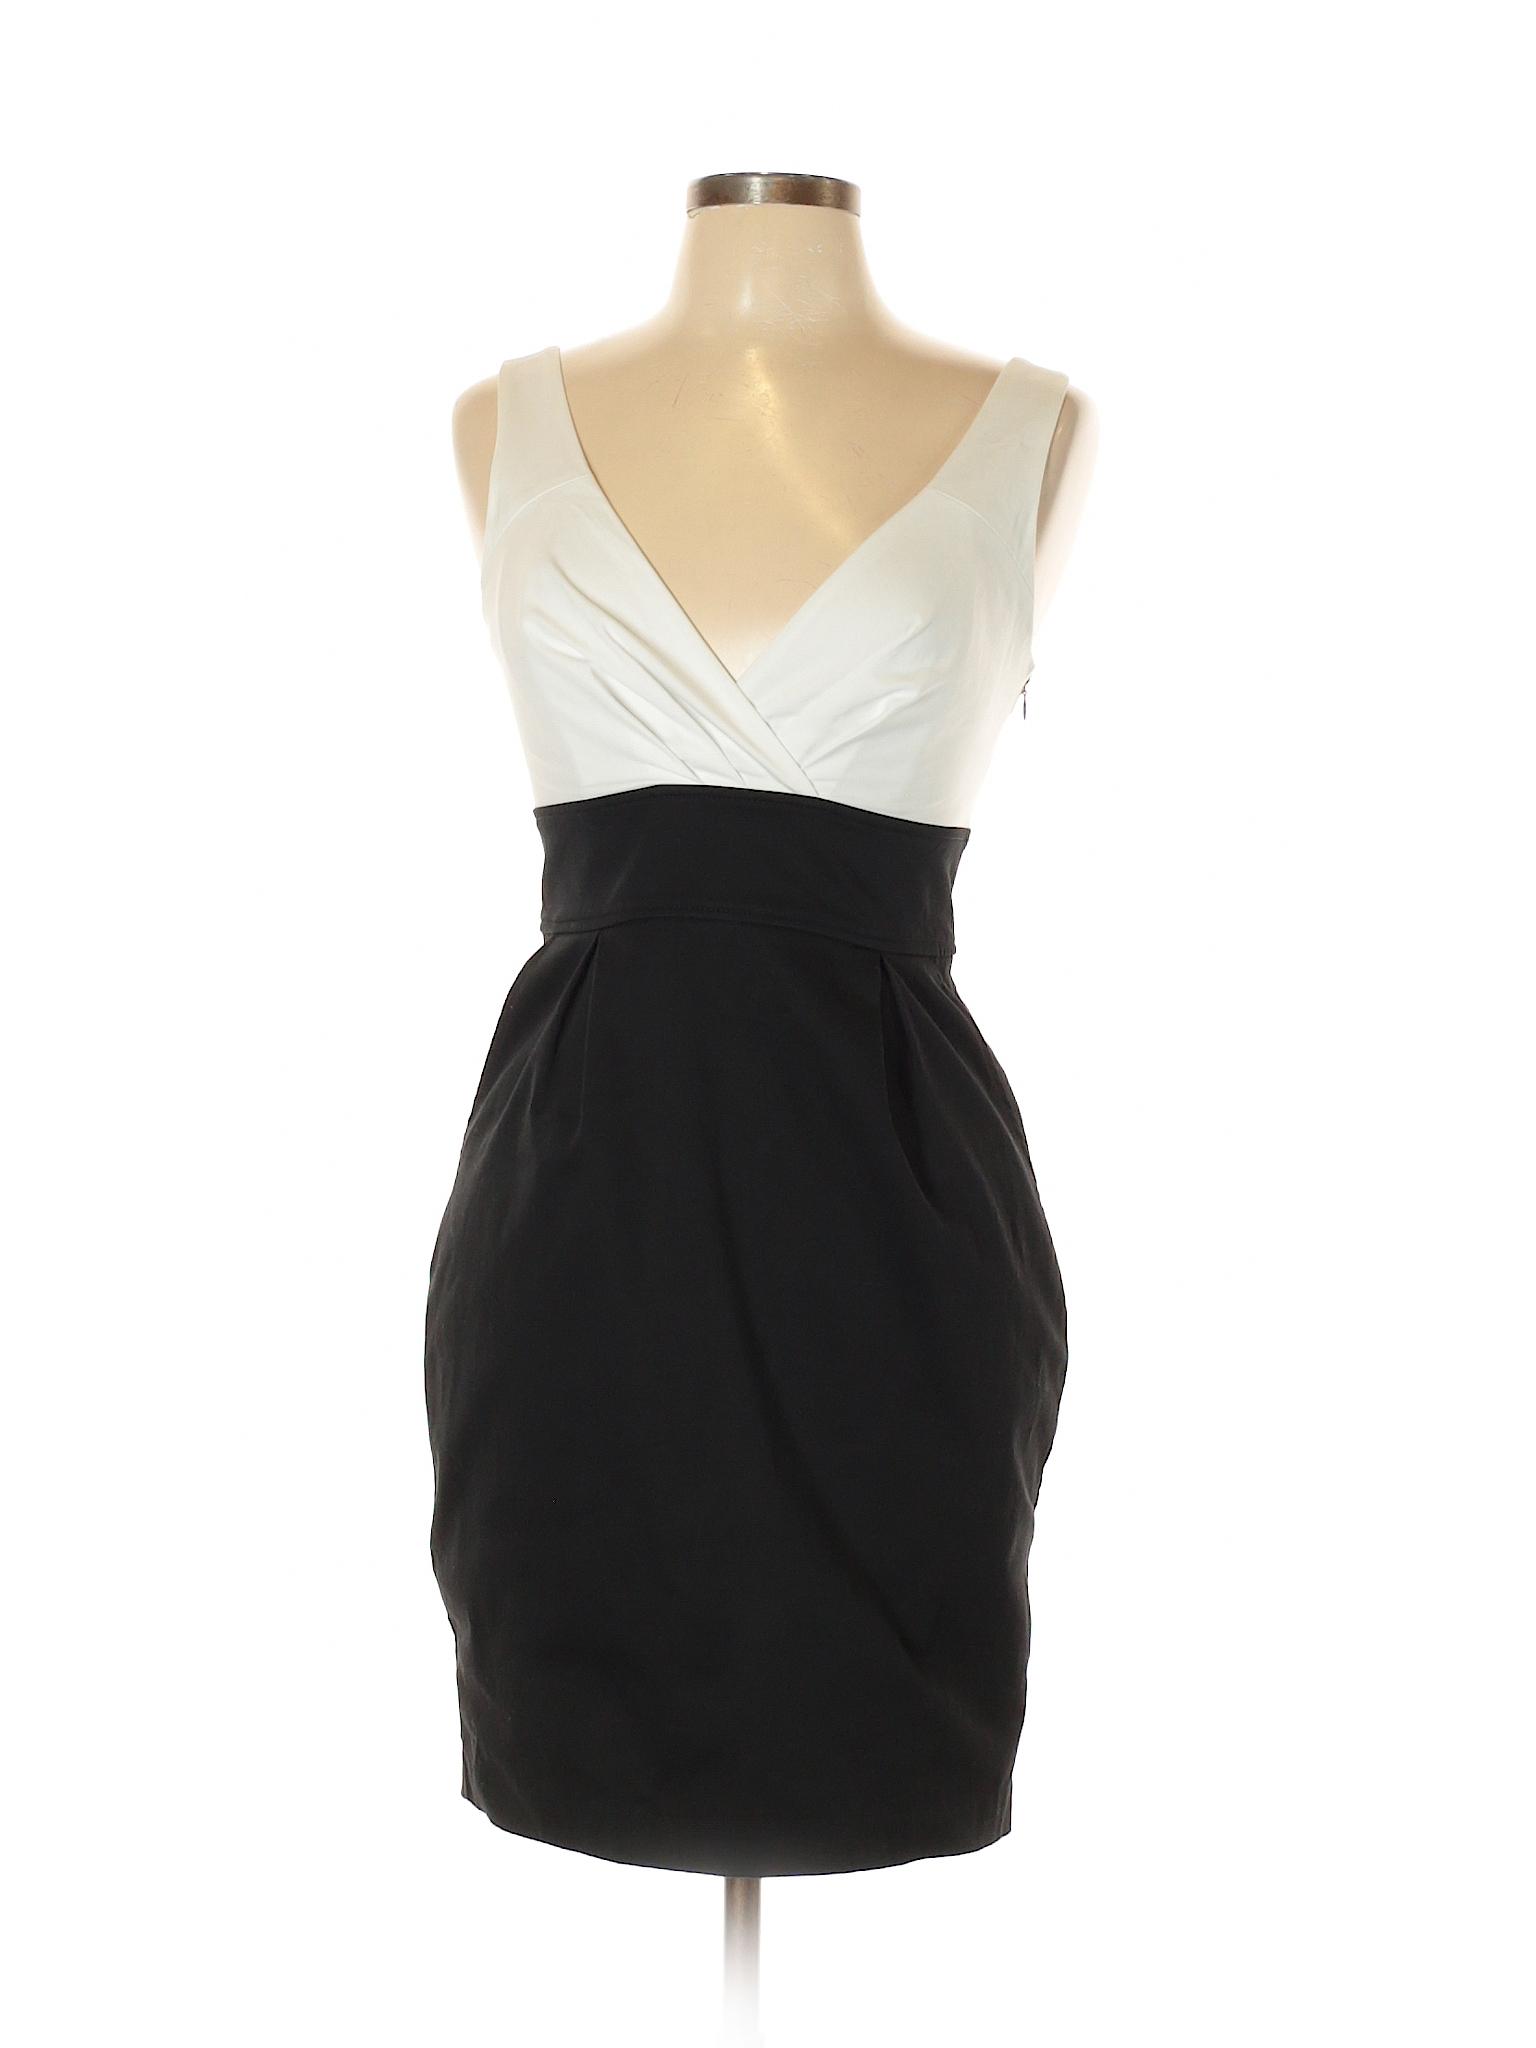 Boutique winter Dress Casual Express Studio Design 00qdzrw